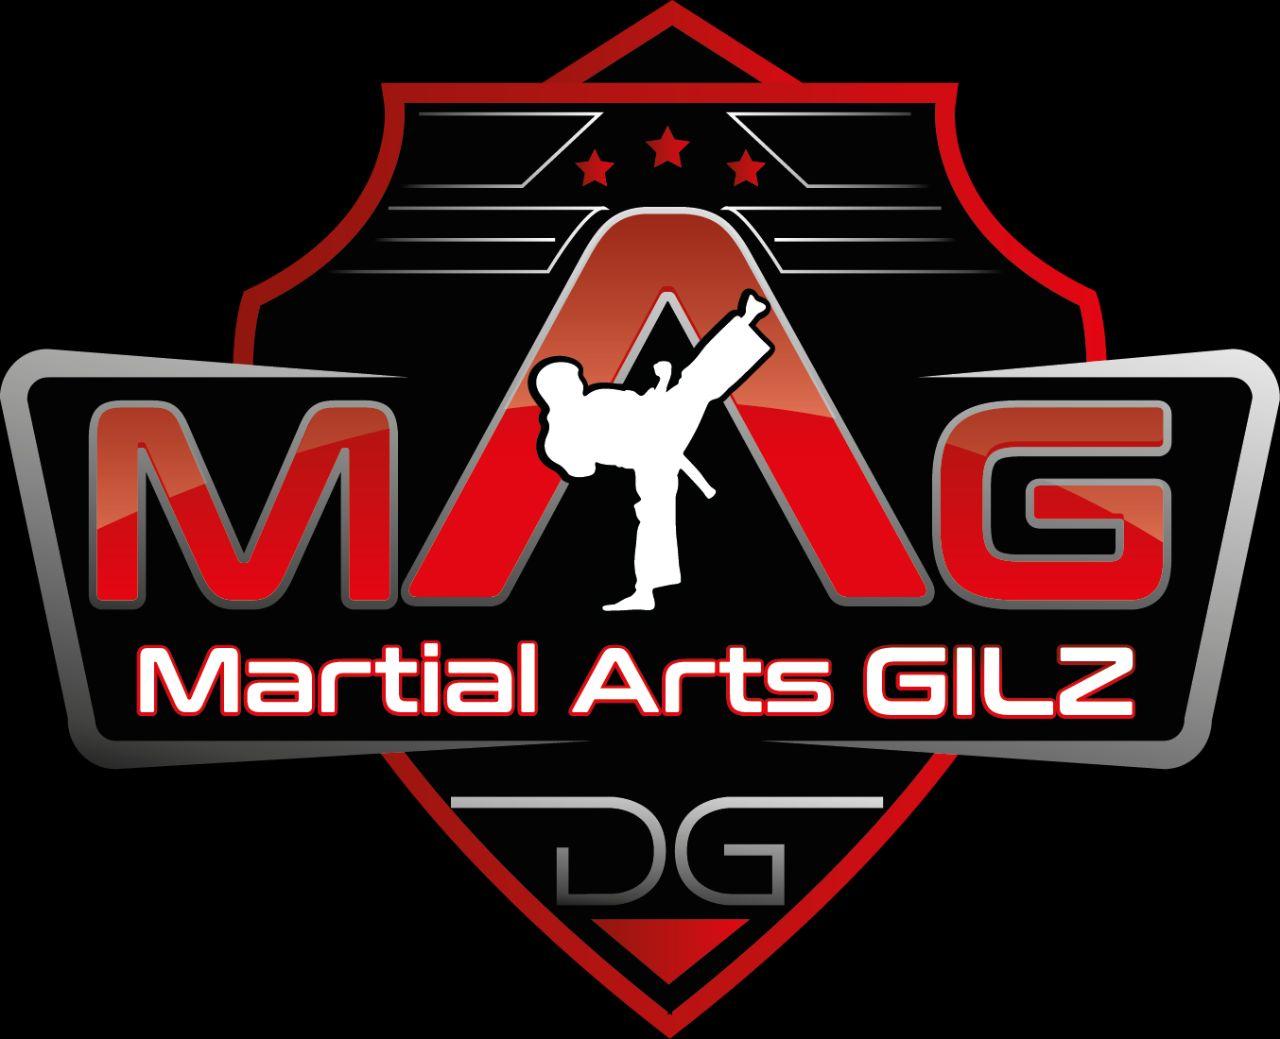 Martial Arts Gilz